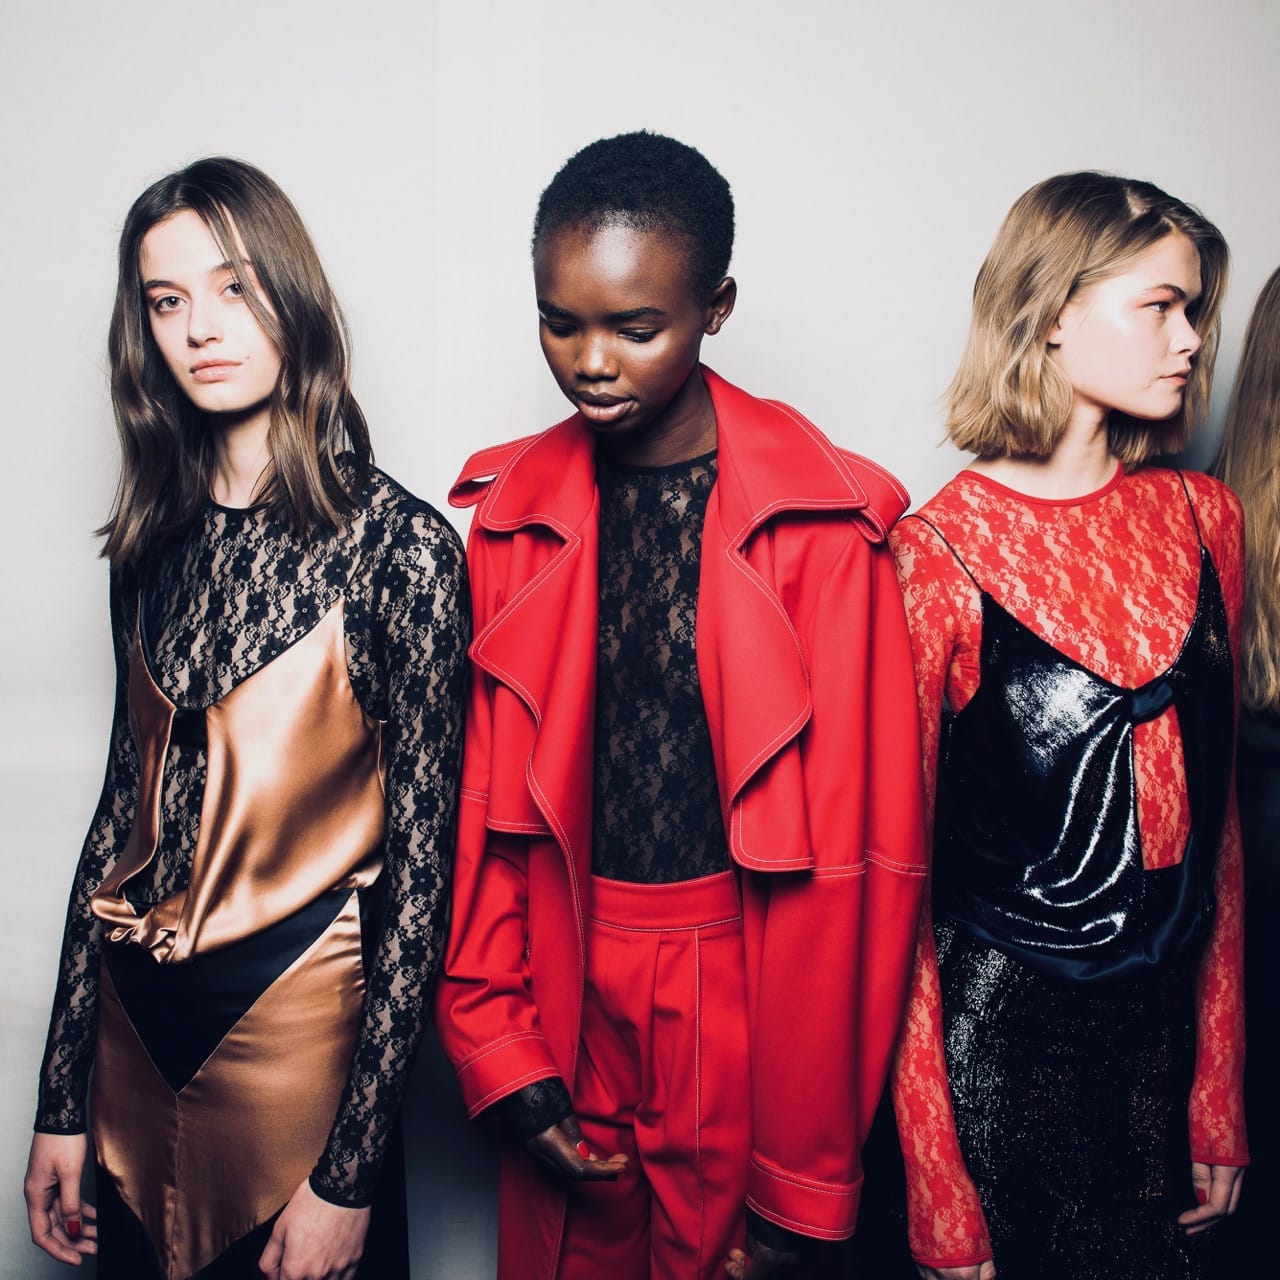 Berlin Fashion Week 2019 3